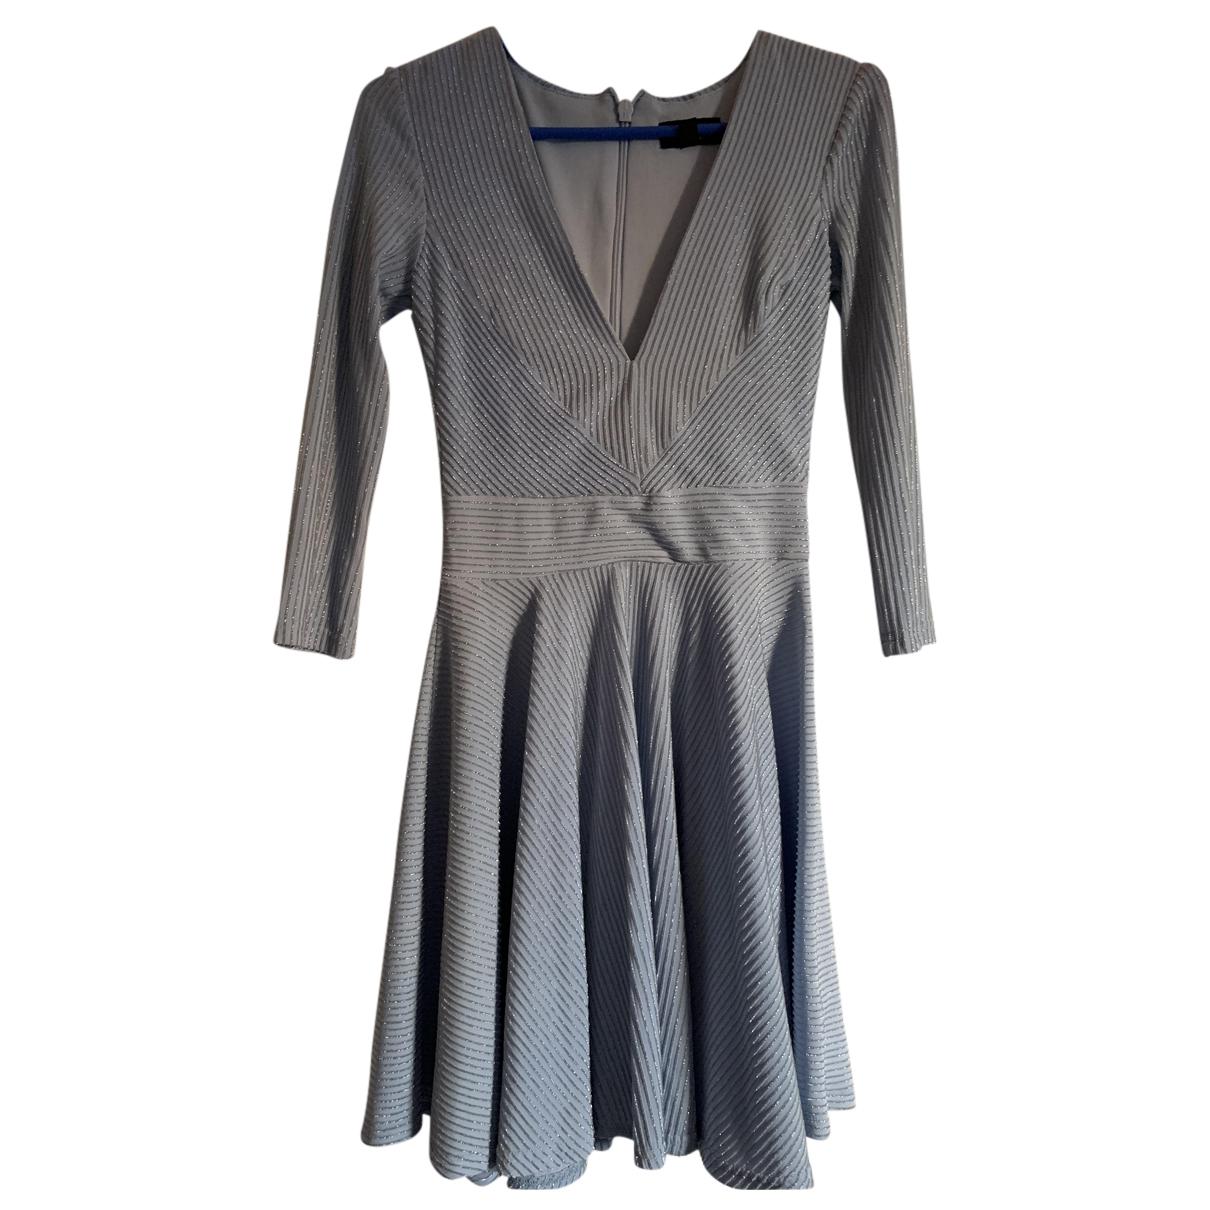 tophop N Brown dress for Women 6 UK